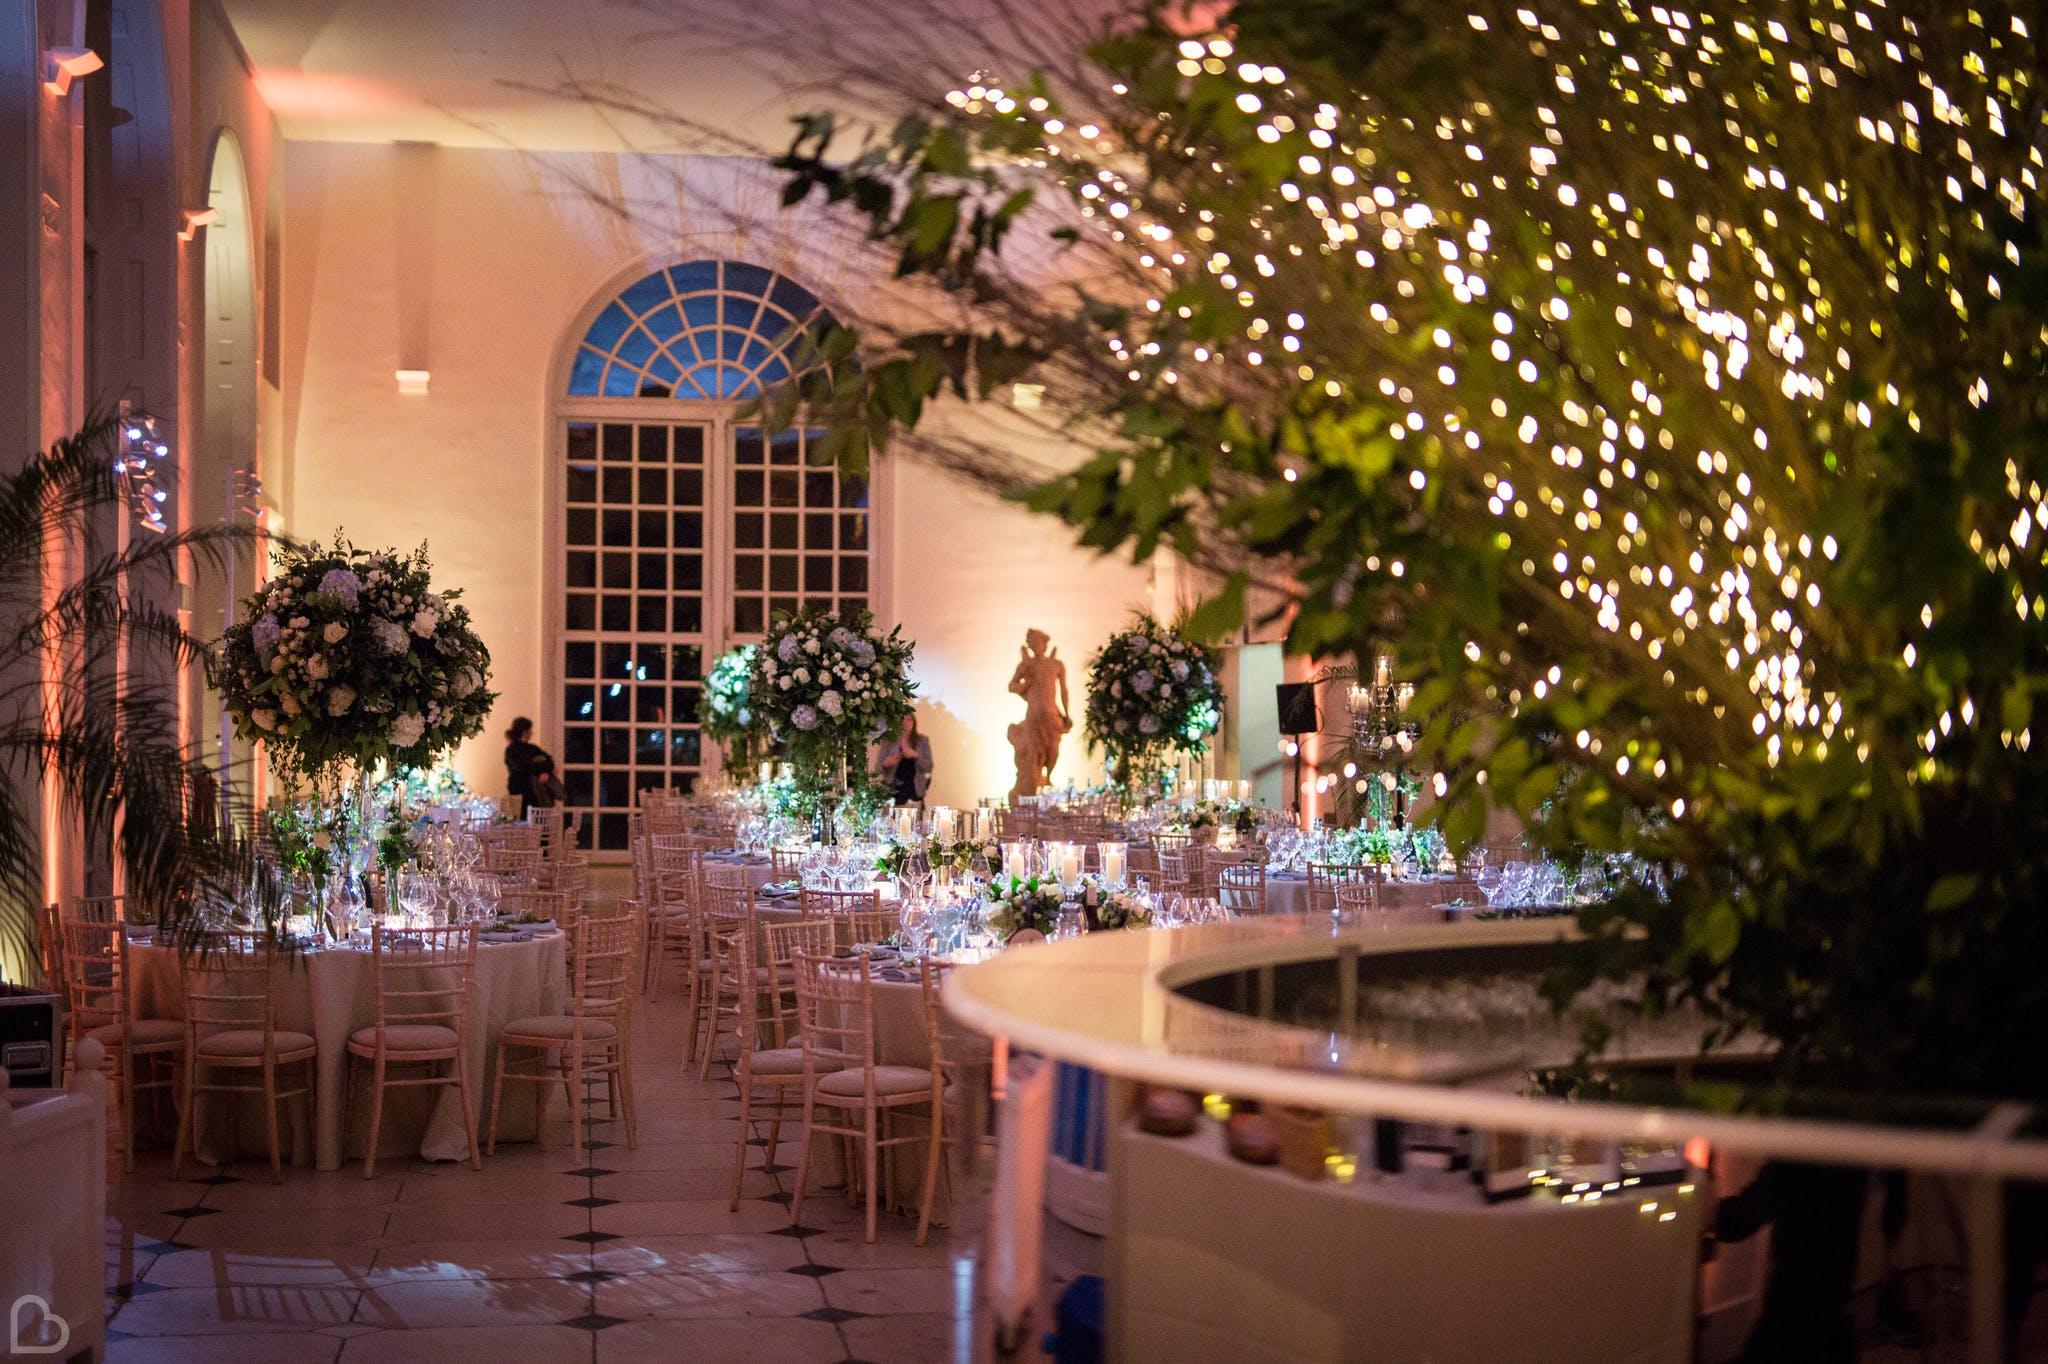 inside the royal botanical gardens, wedding reception venue in london